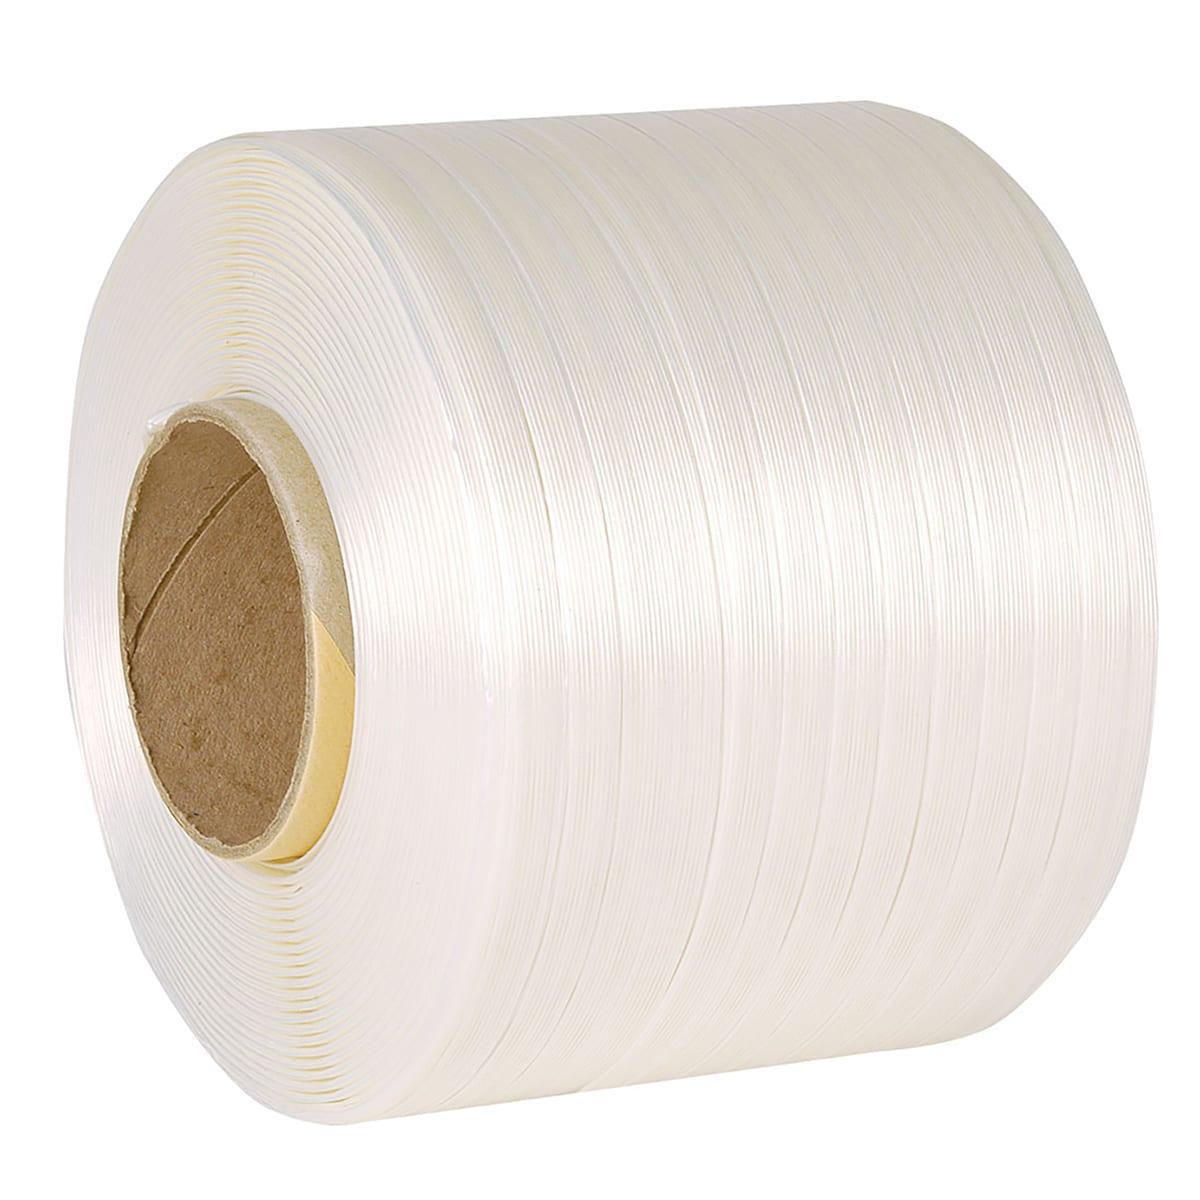 4 coils per box Tape 13mm Baler Strap Top Quality 500m per coil